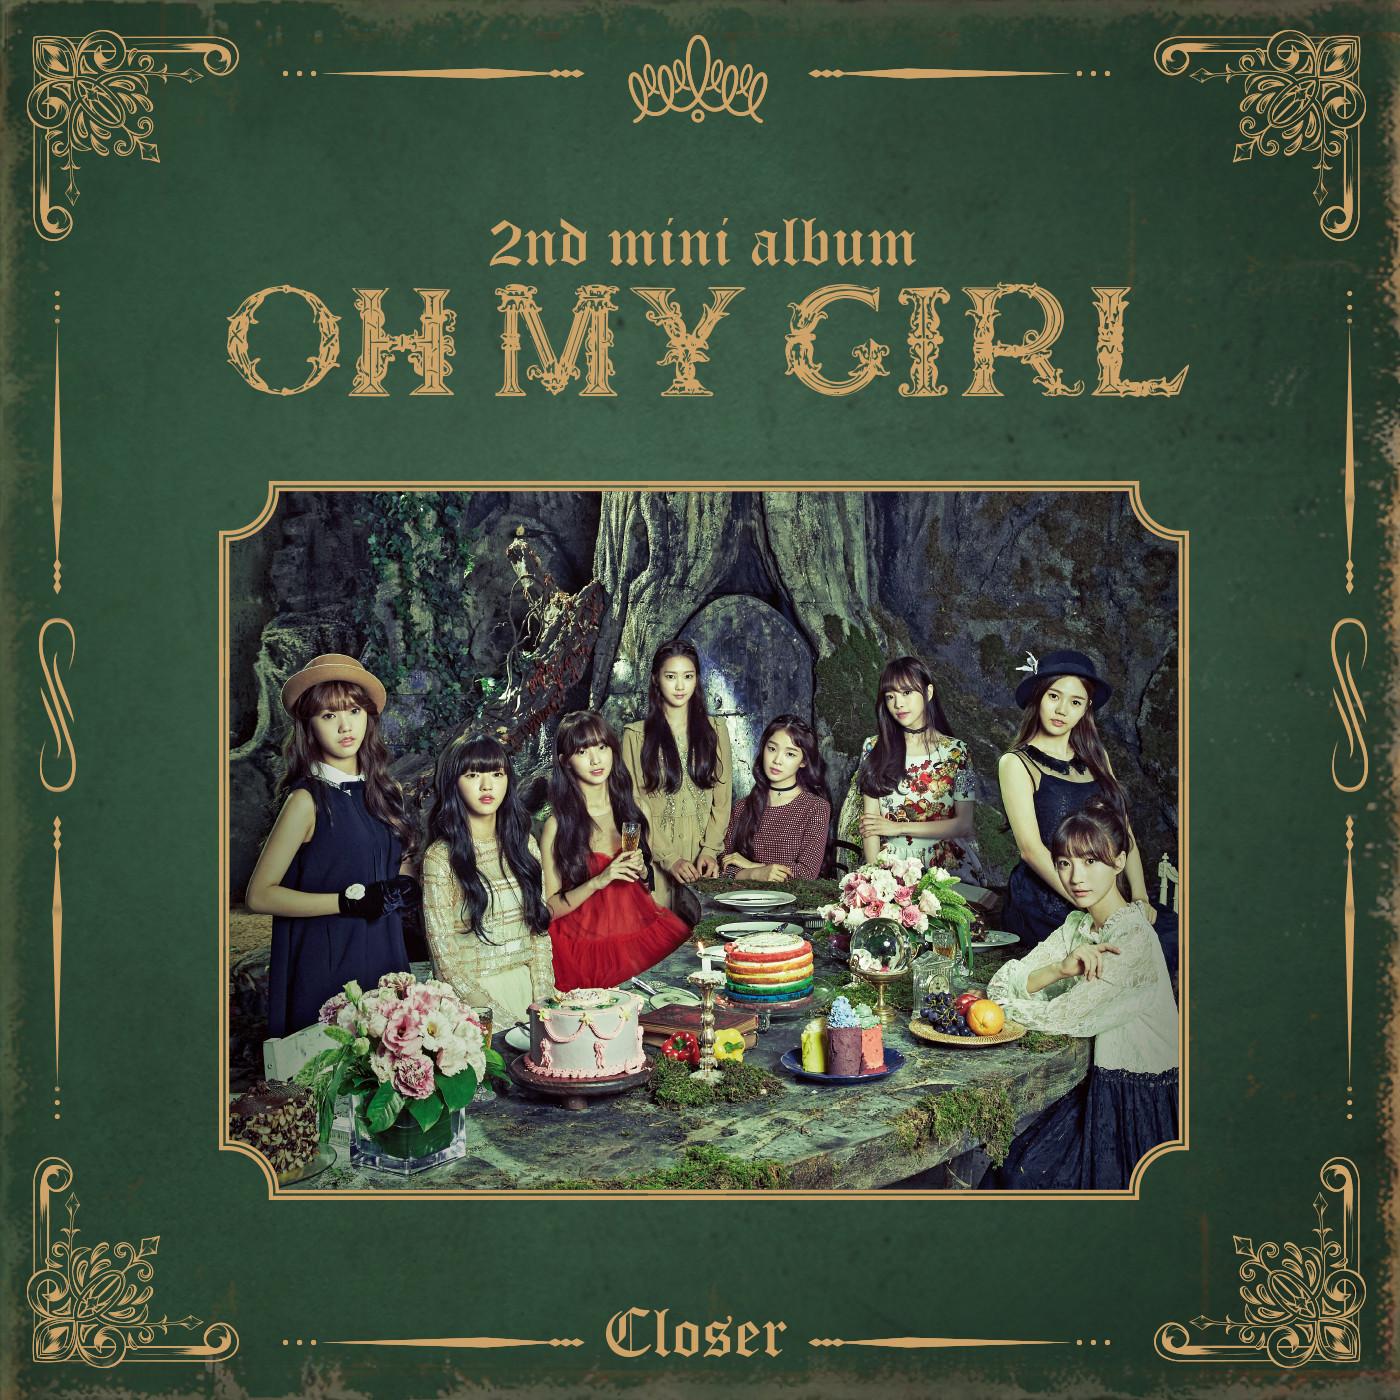 Closer (OH MY GIRL)